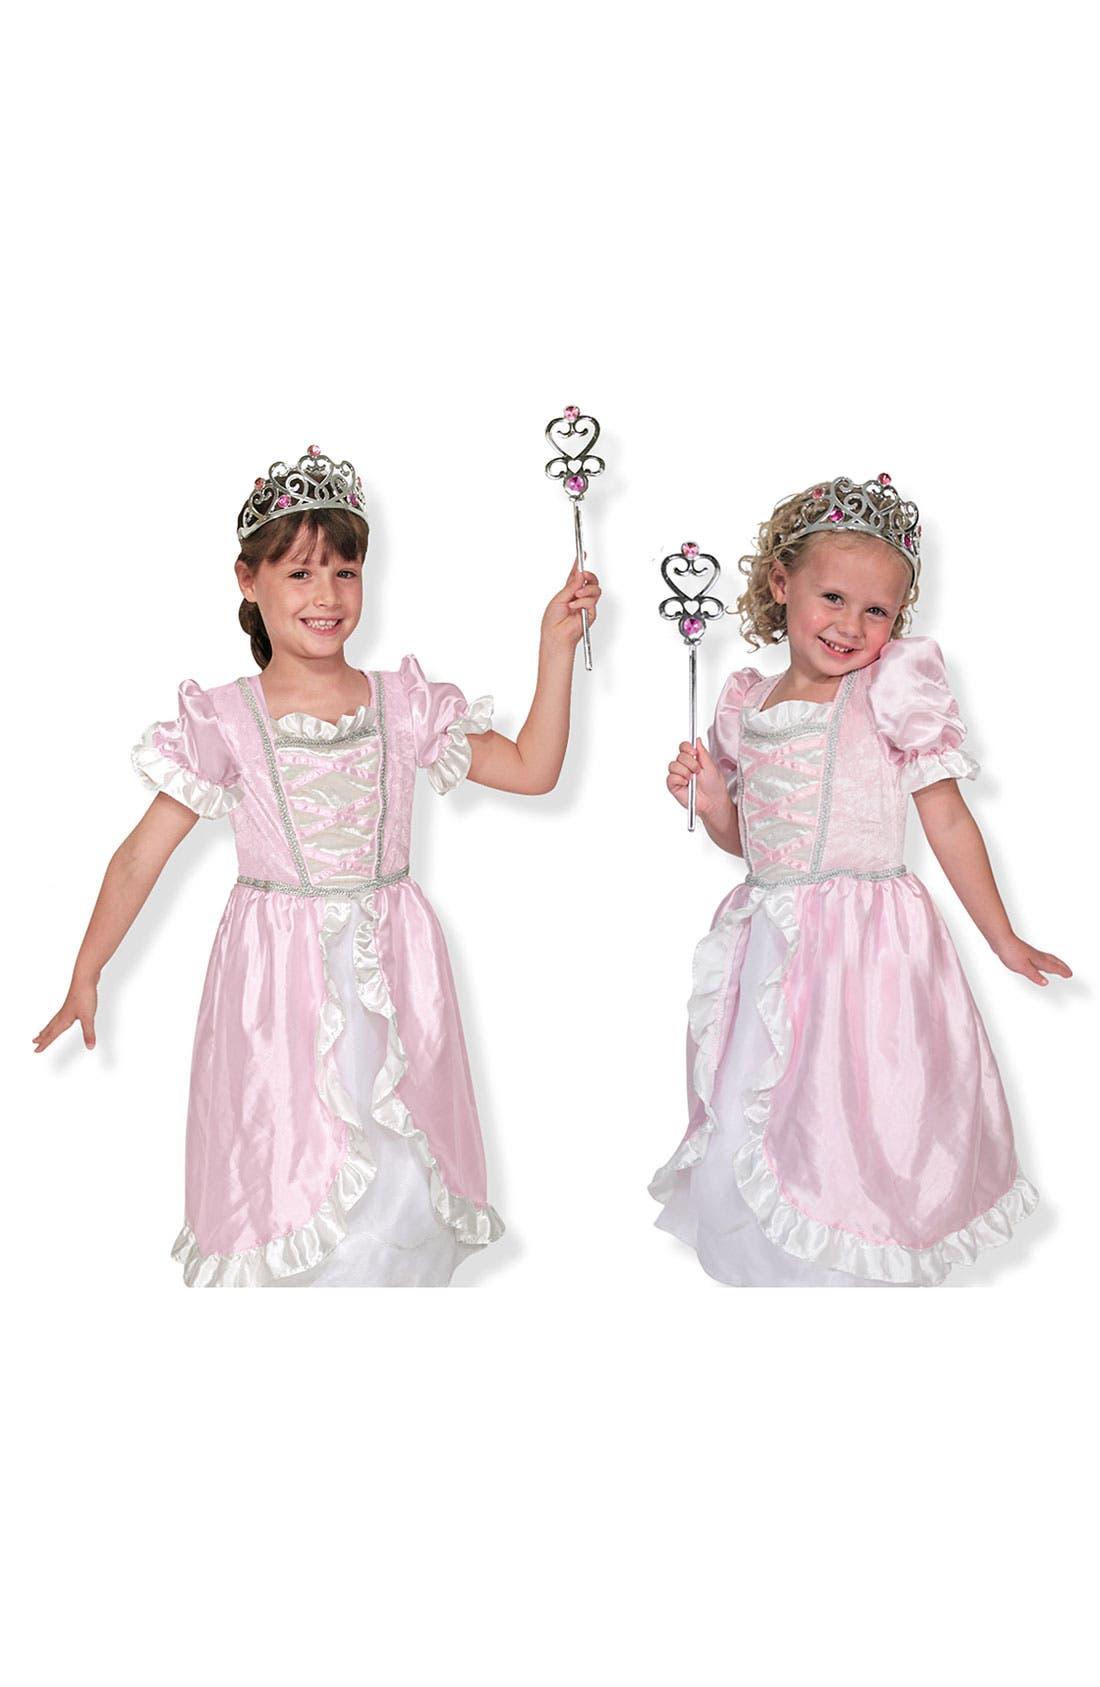 Alternate Image 1 Selected - Melissa & Doug Princess Costume (Little Girls)